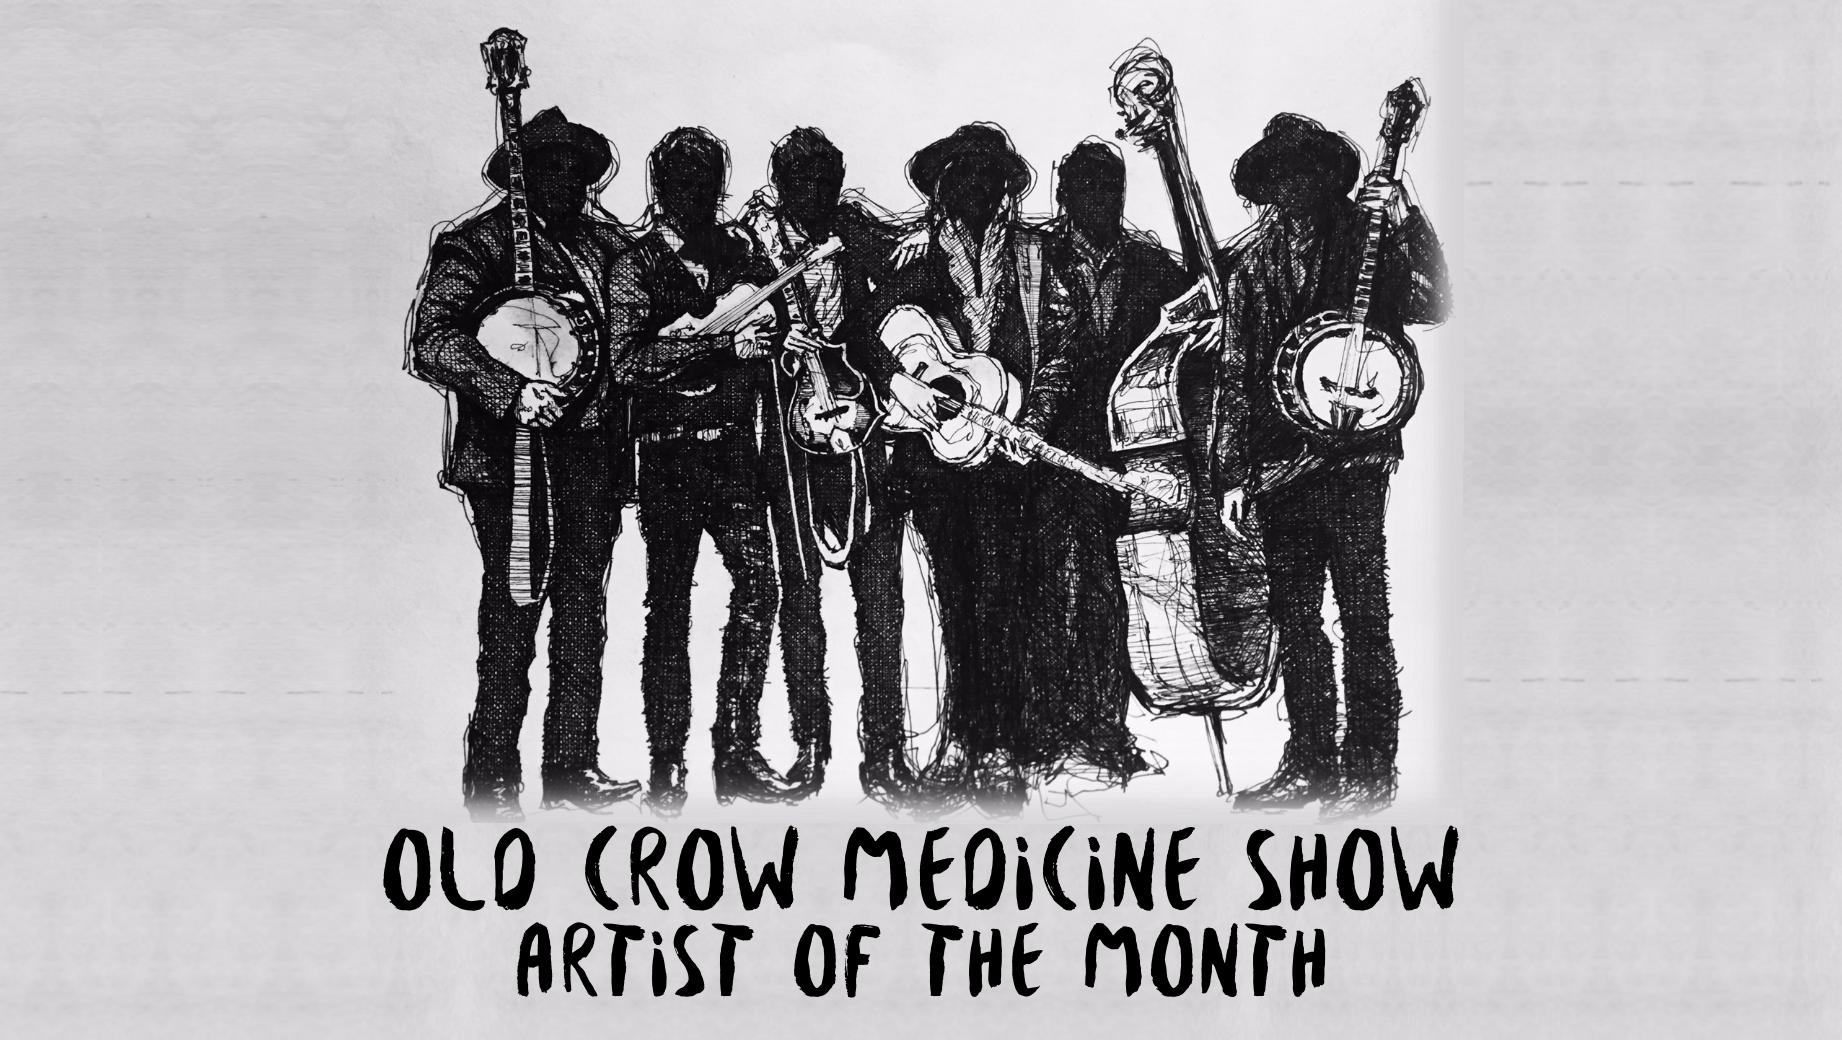 Old Crow Medicine Show: